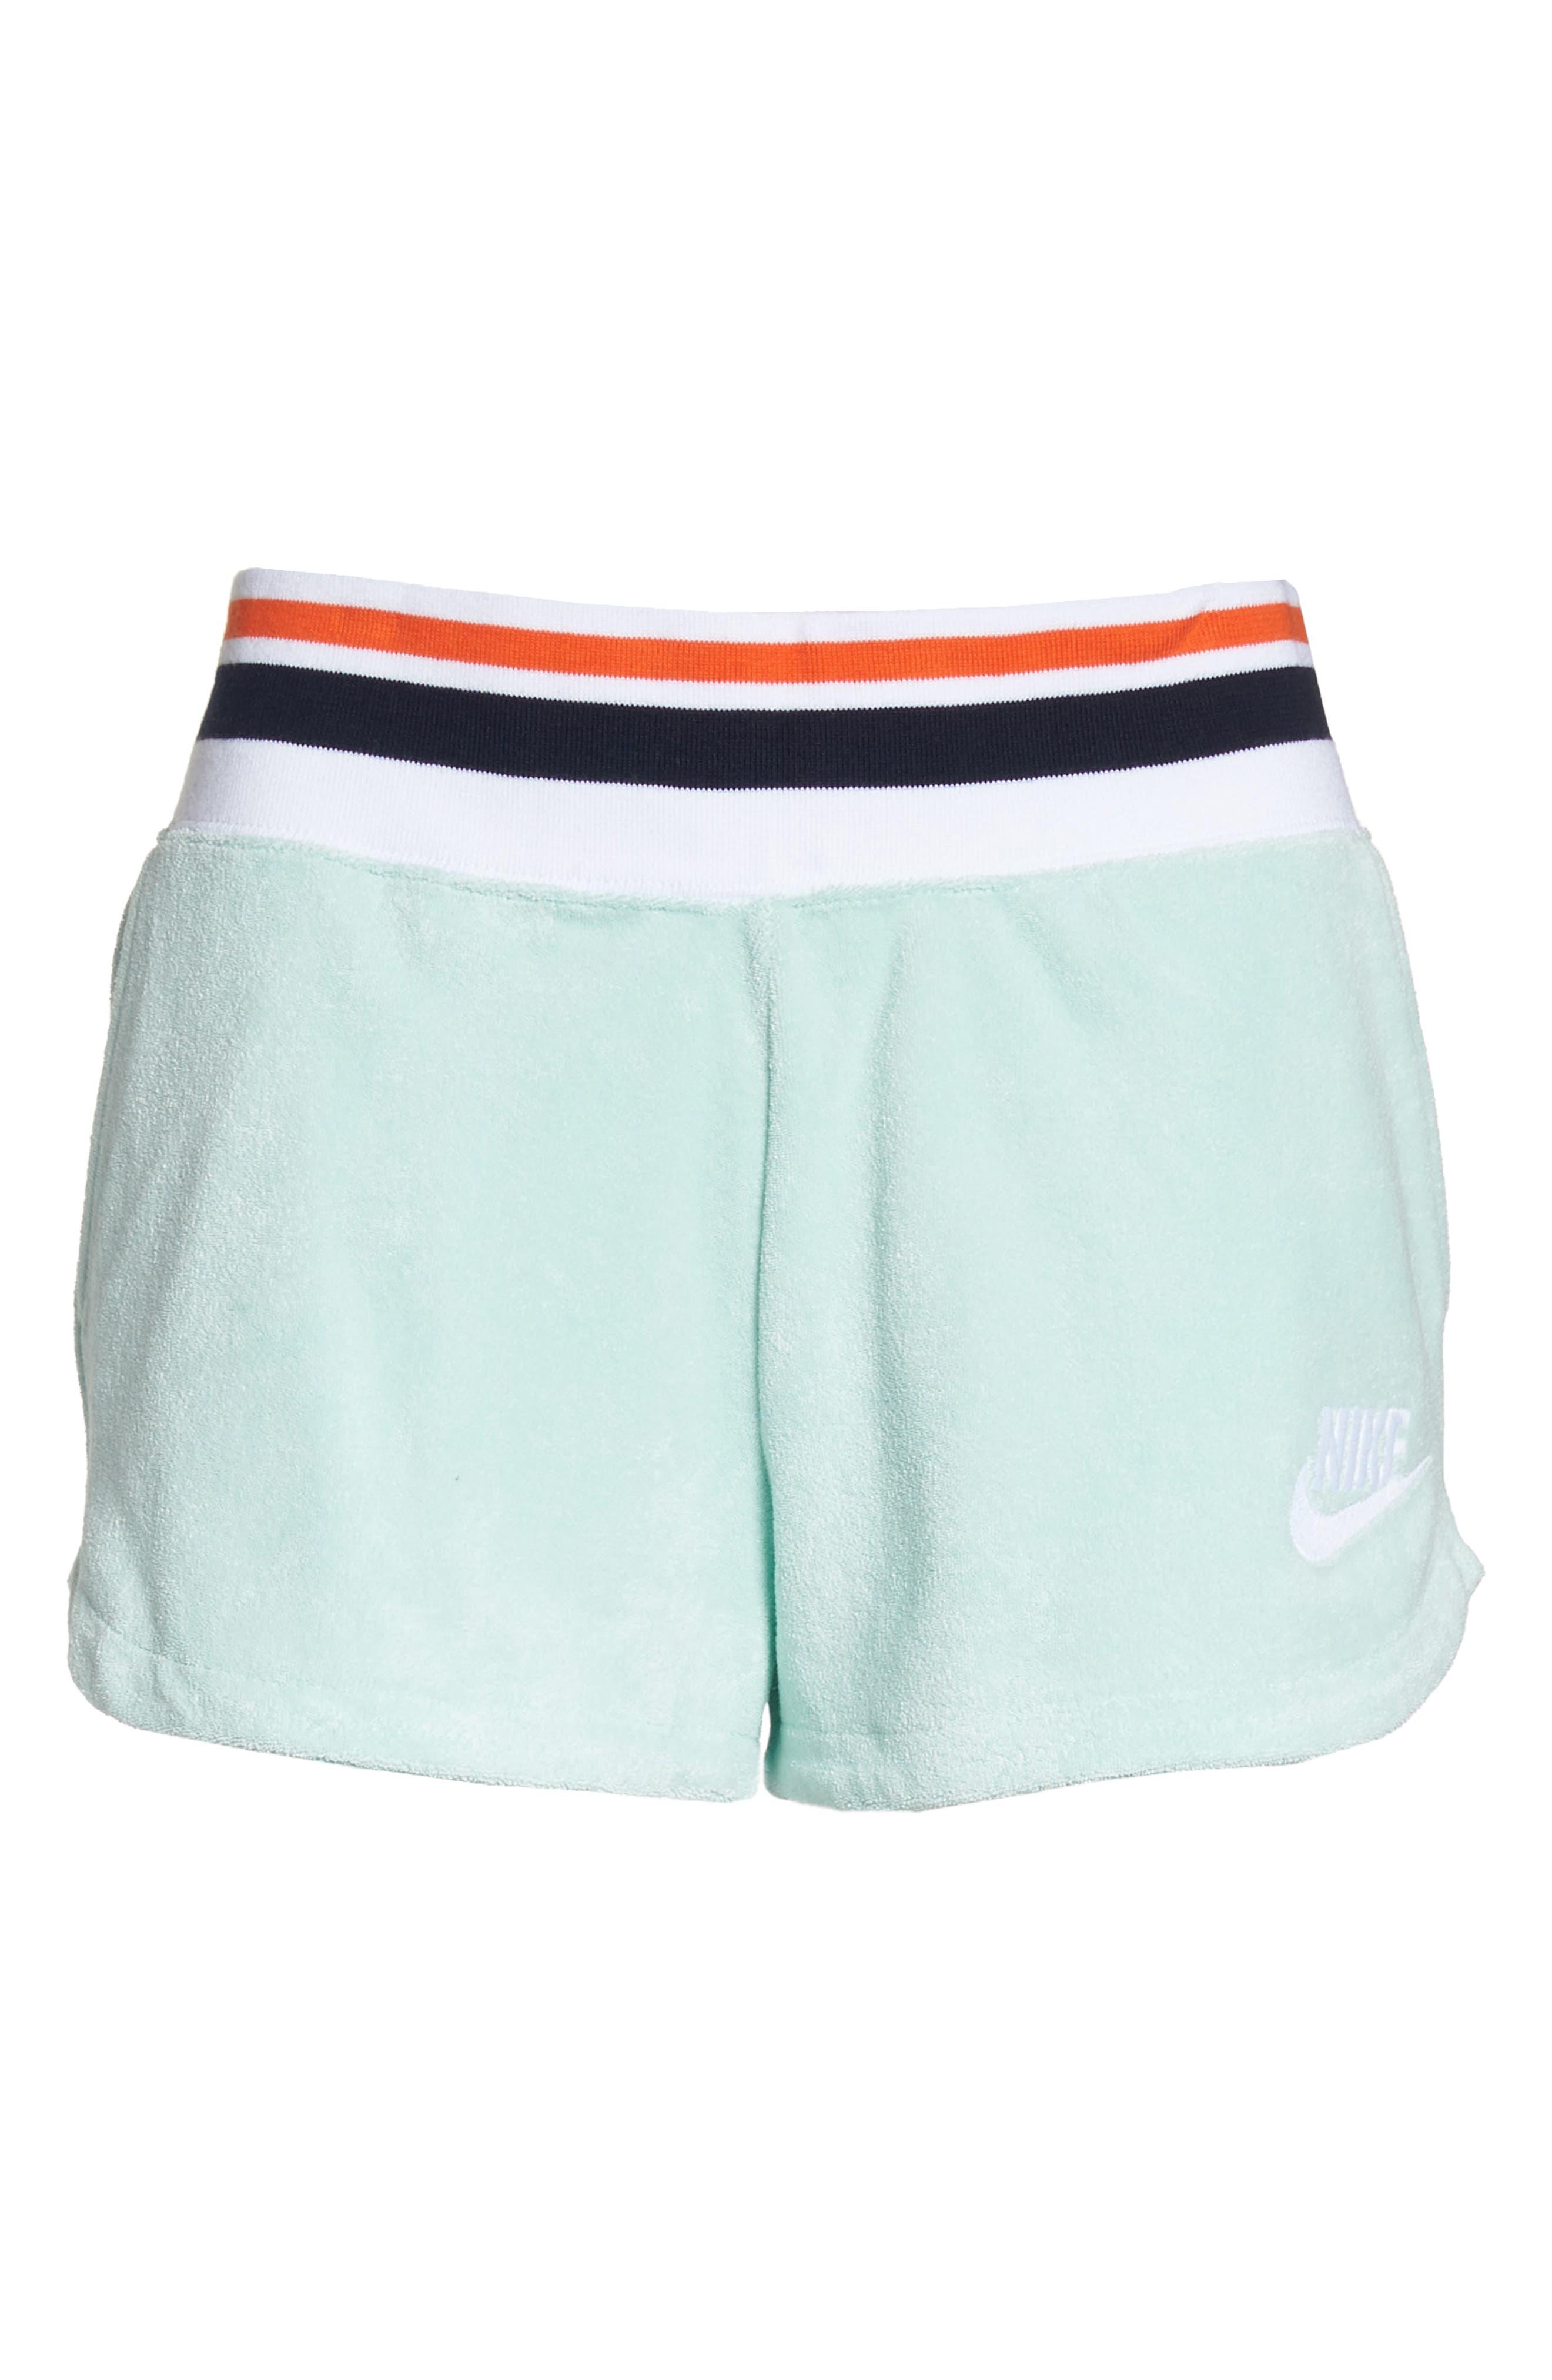 NIKE,                             Sportswear Terry Shorts,                             Alternate thumbnail 7, color,                             401